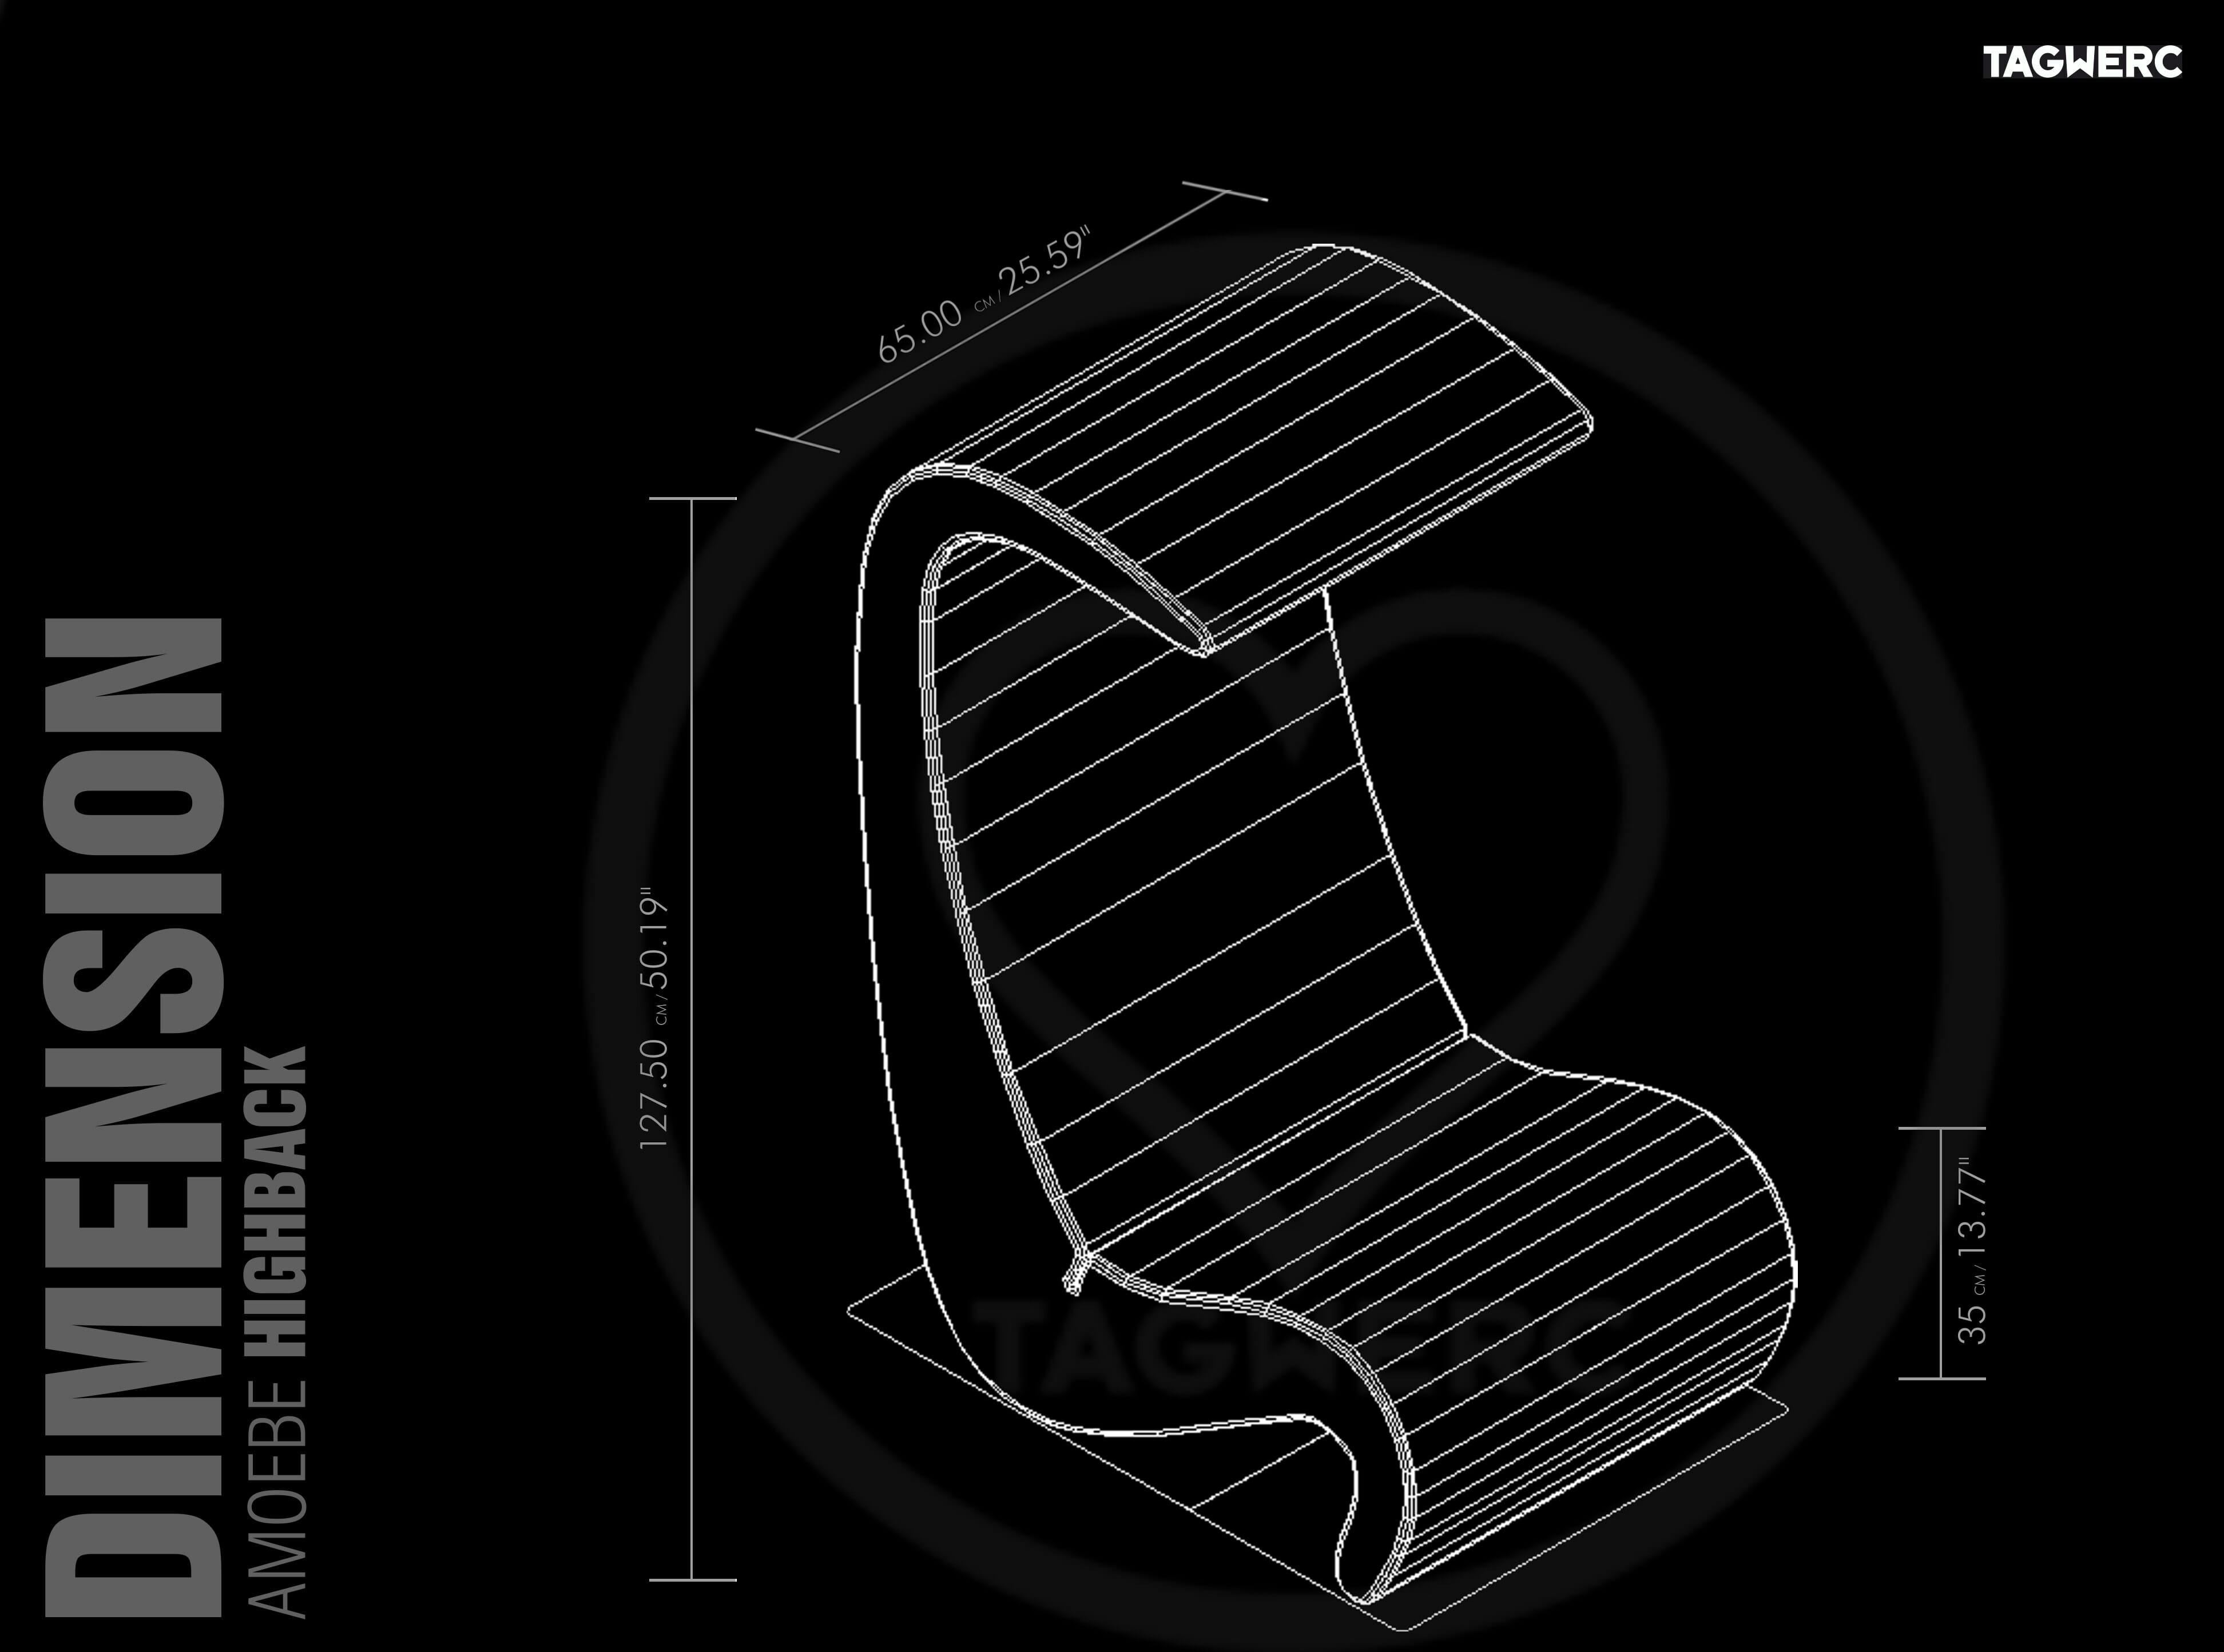 Vitra Amoebe Highback Lounge Chair Fabric Tonus Verner